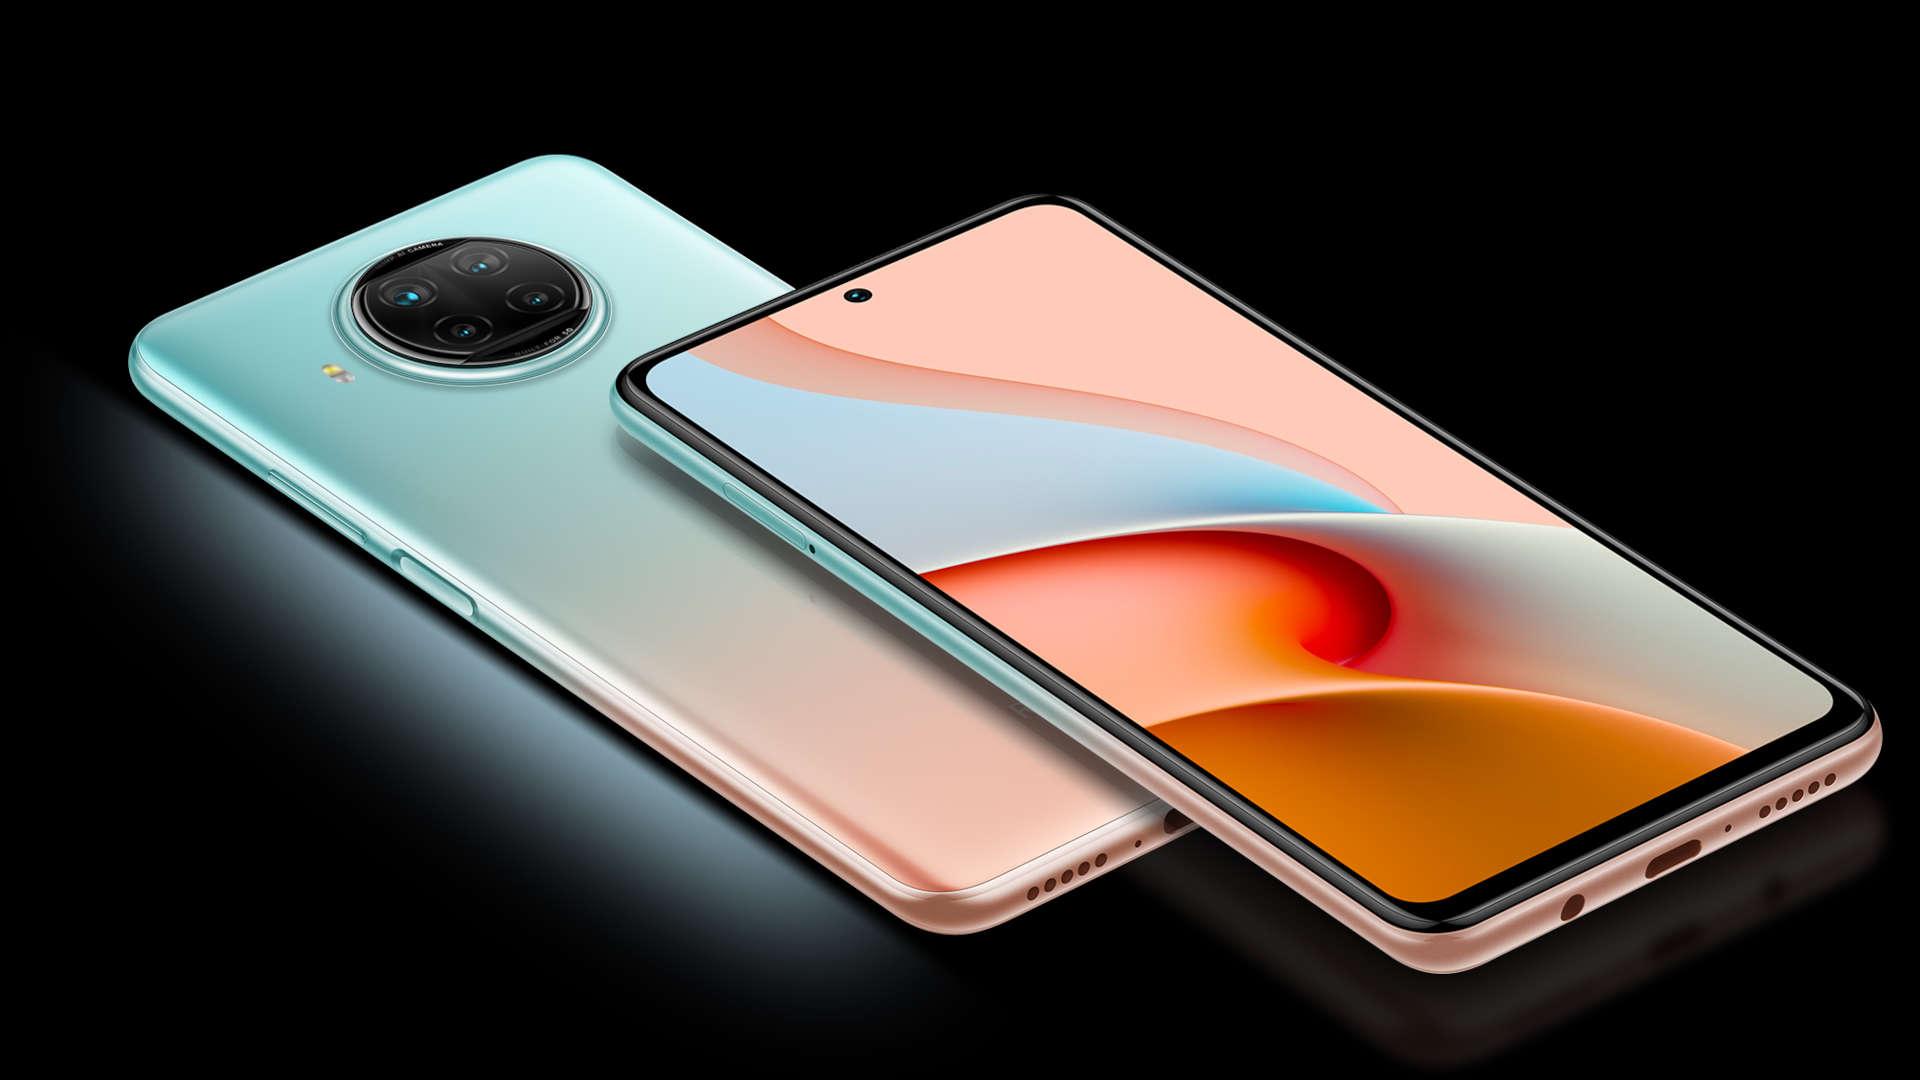 Xiaomi Mi 10i: كل الشائعات الموجودة في ورقة البيانات الفنية والسعر والتاريخ  - GizChina.it